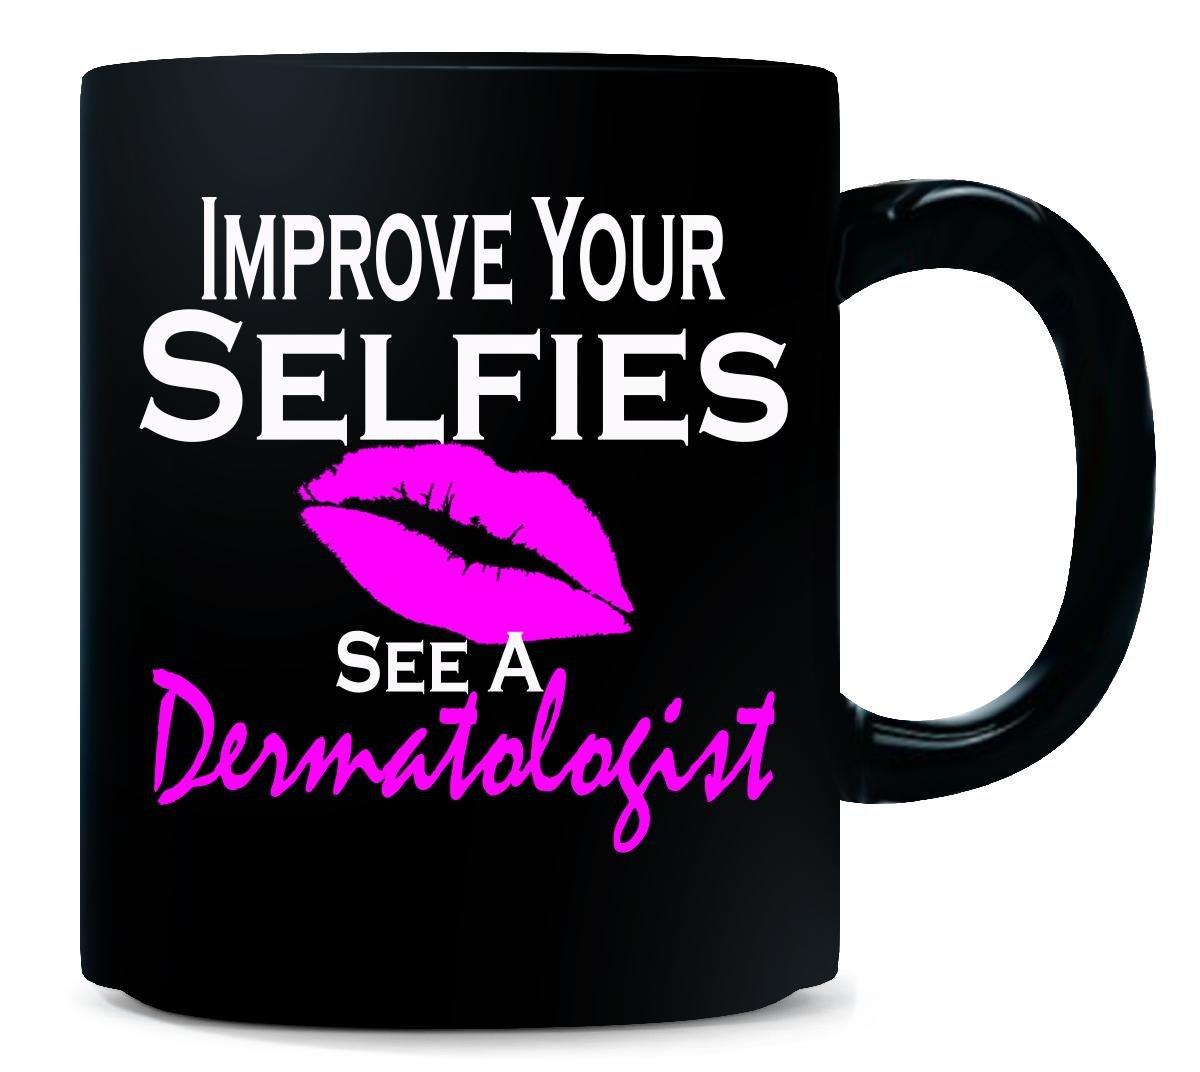 Improve Your Selfies See A Dermatologist Dermatology Med Spa - Mug